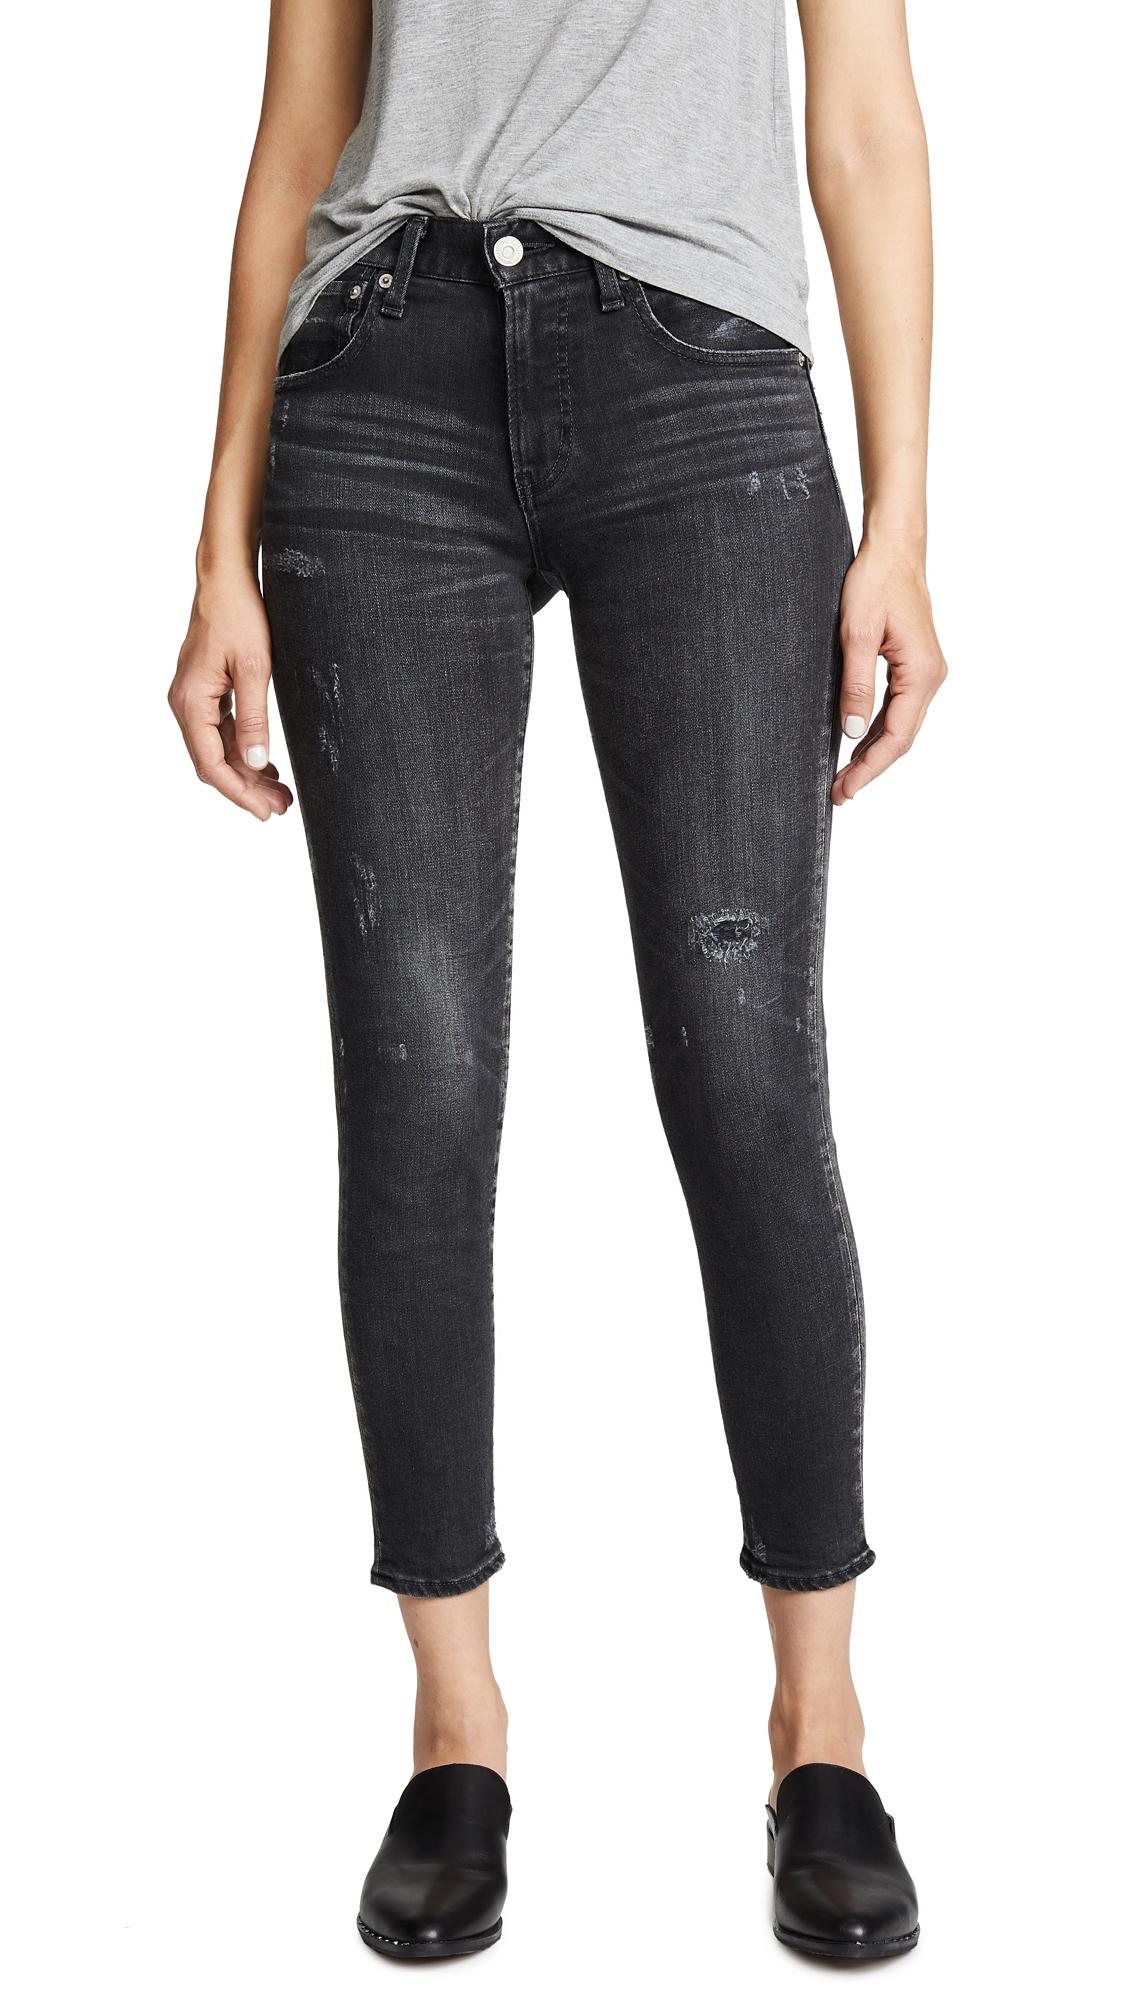 MOUSSY VINTAGE Velma Comfort Skinny Jeans In Black